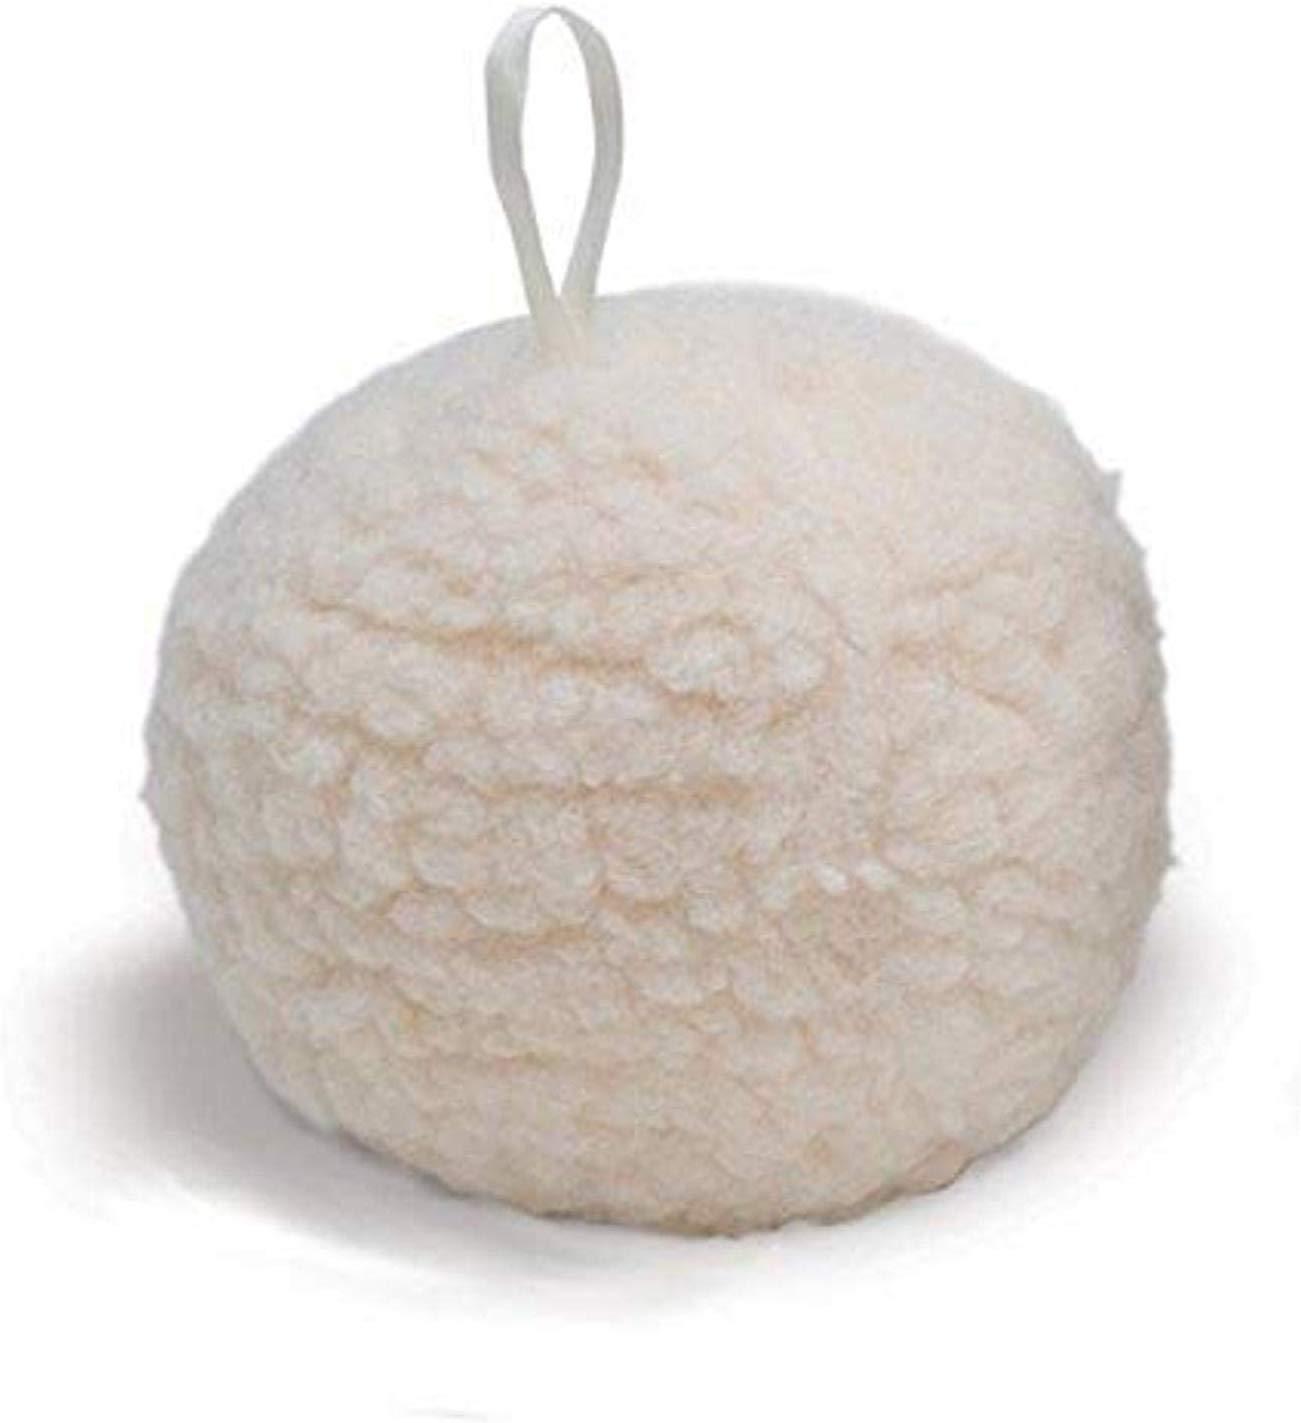 PetSafe Sheepskin Ball Dog Toy Image